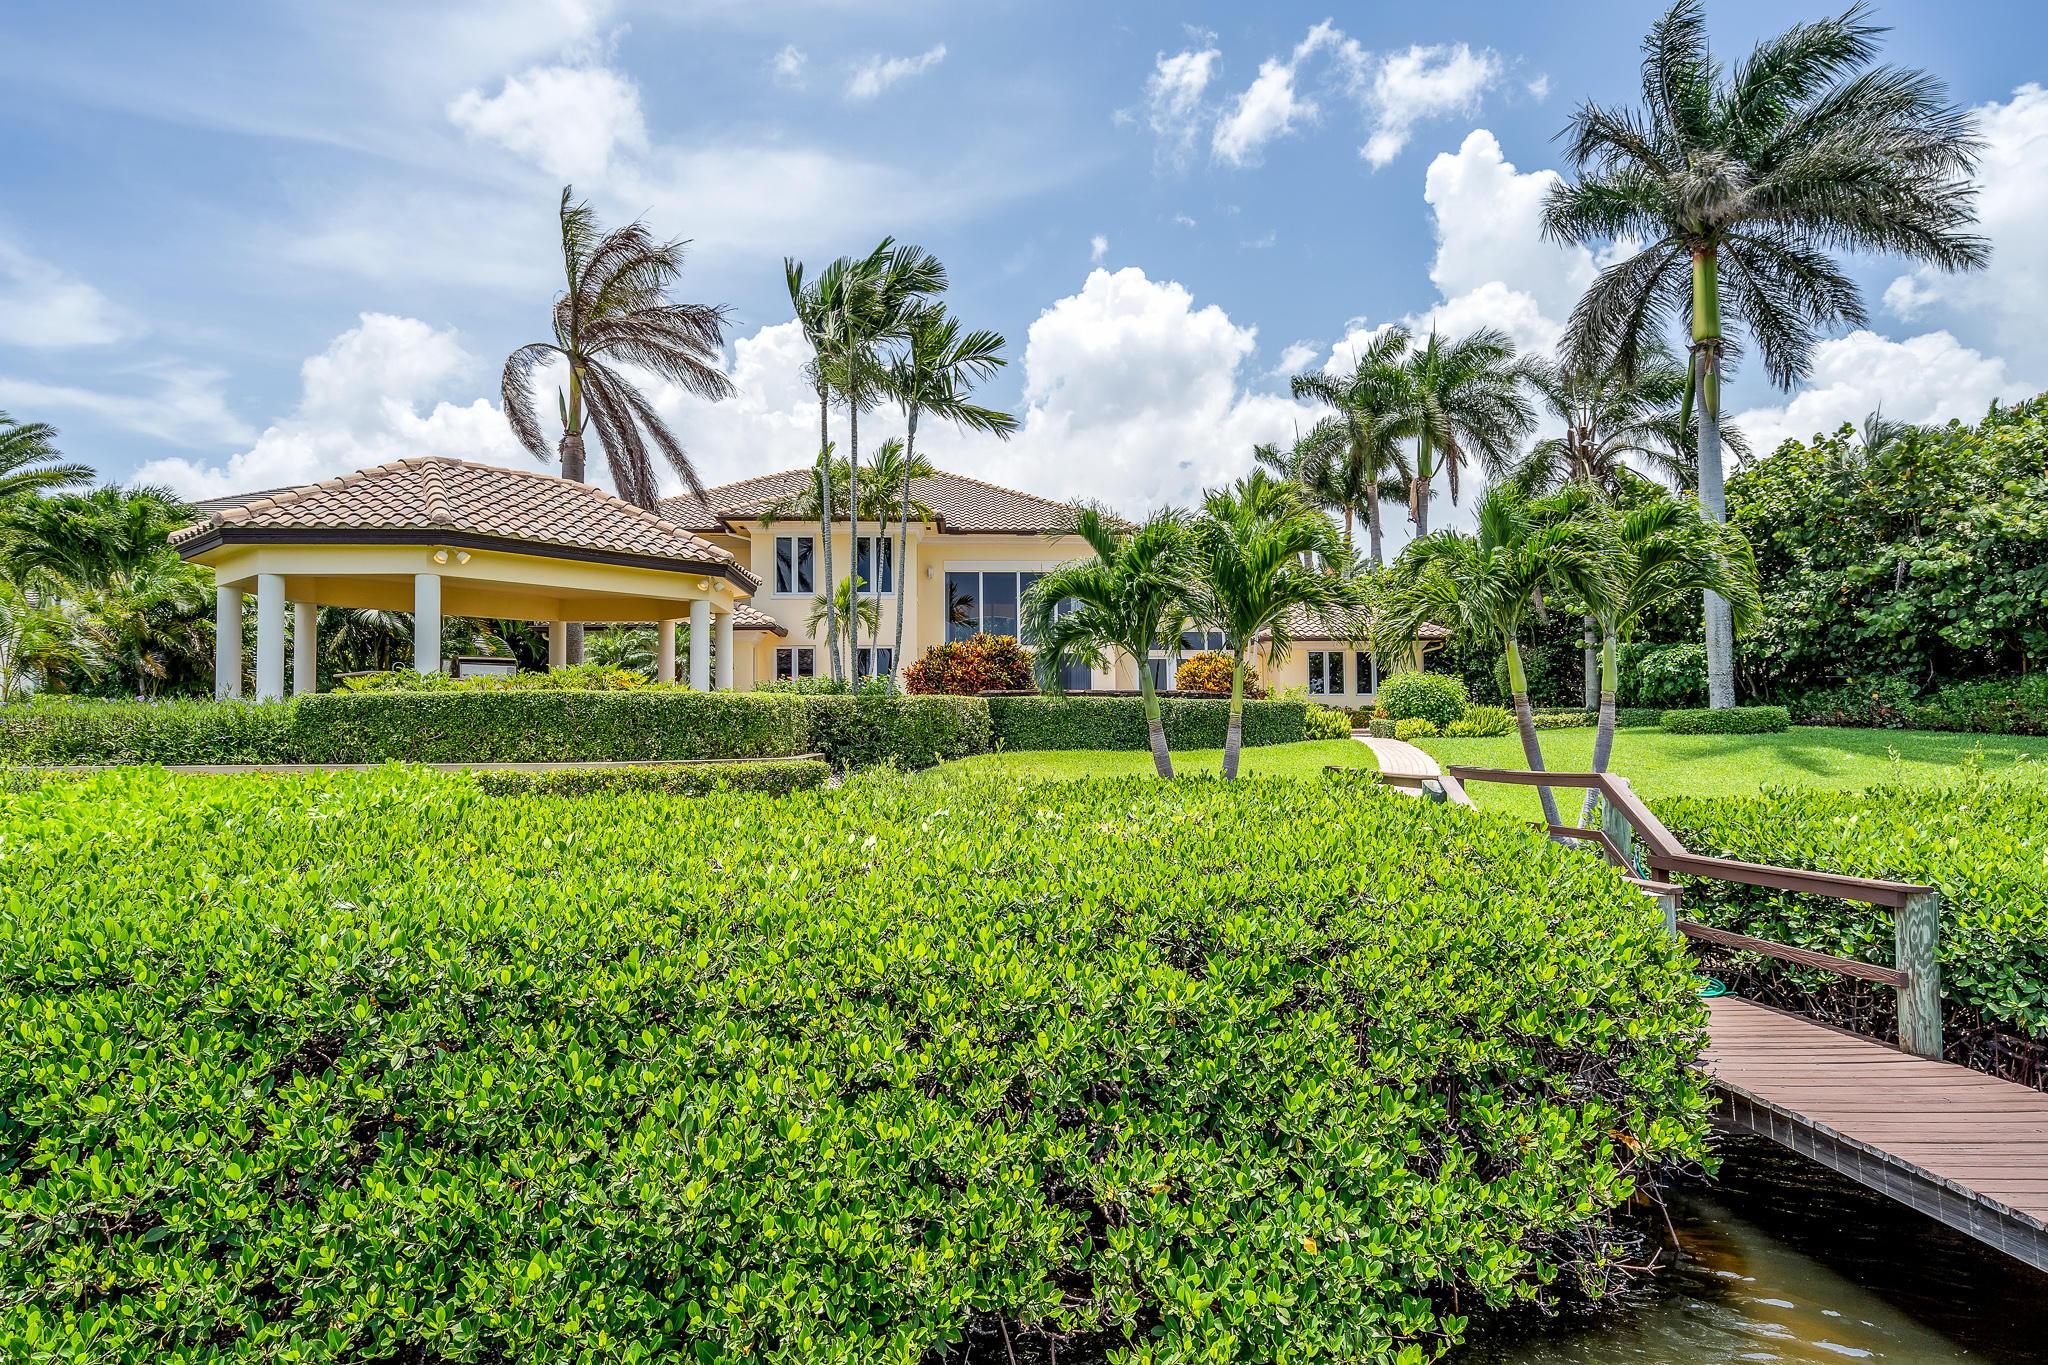 227 Commodore Drive, Jupiter, Florida 33477, 5 Bedrooms Bedrooms, ,6.2 BathroomsBathrooms,A,Single family,Commodore,RX-10452214